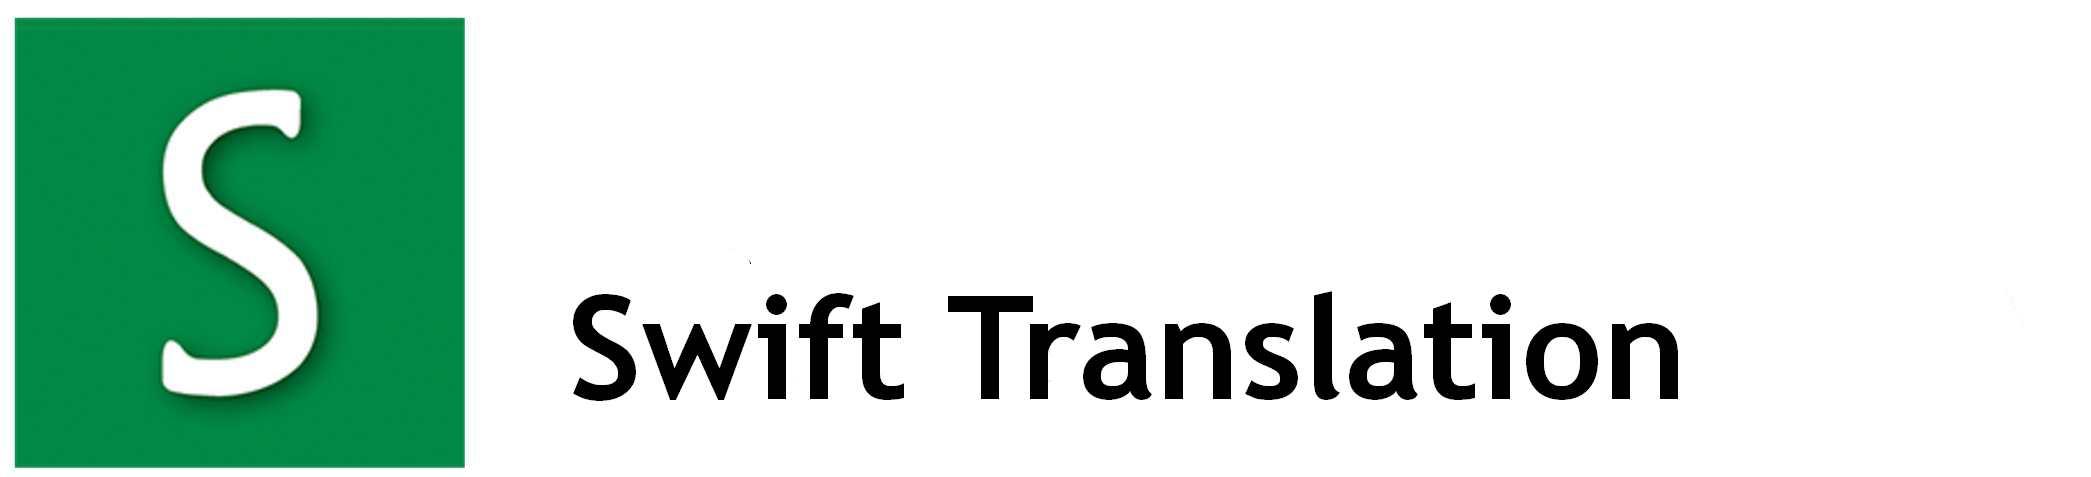 S Swift Translation